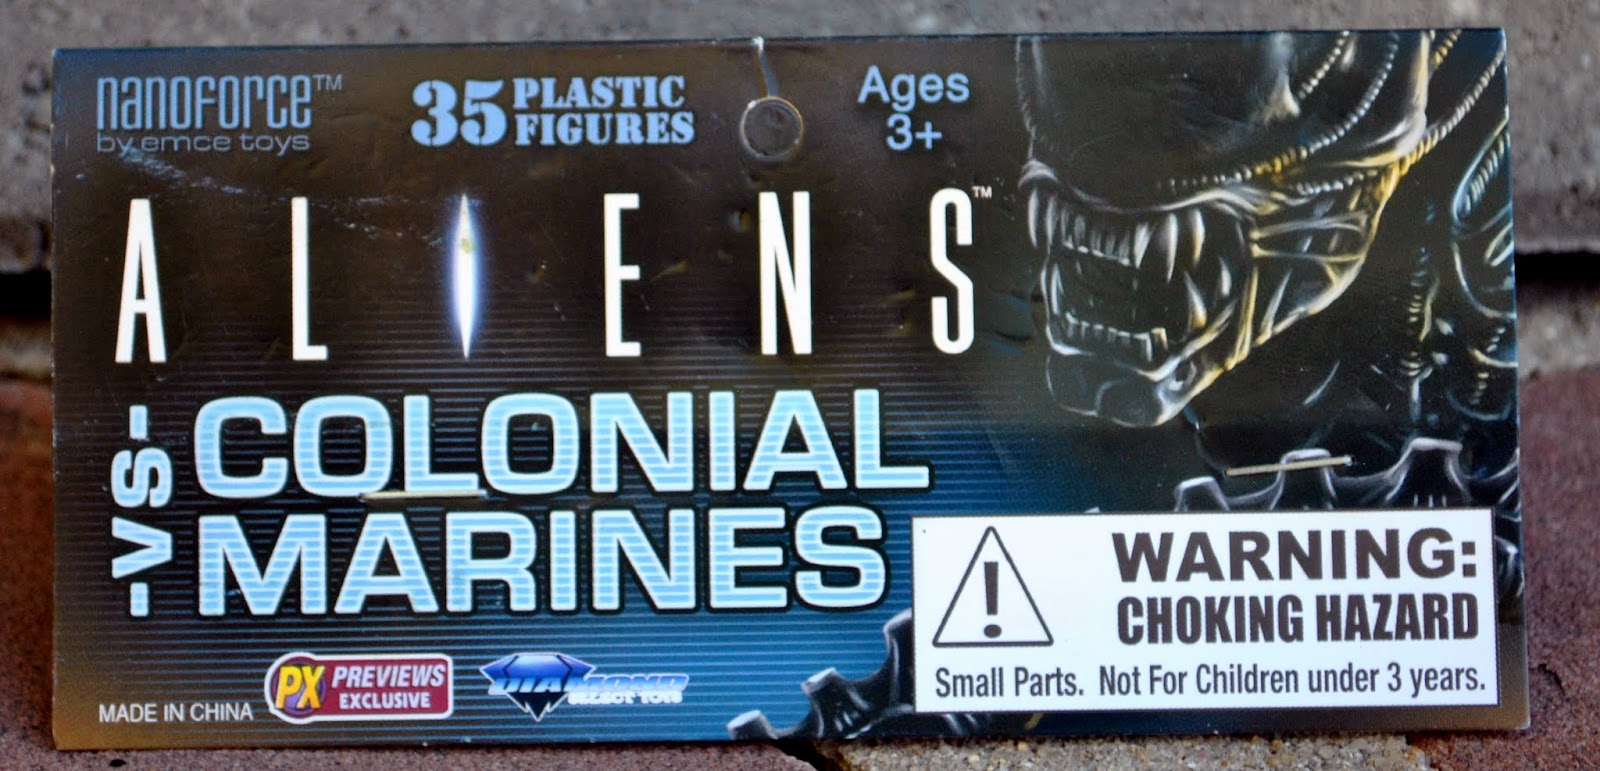 10 per bag 4 bags of ALIENS vs COLONIAL MARINES  PLASTIC MINI-FIGURES